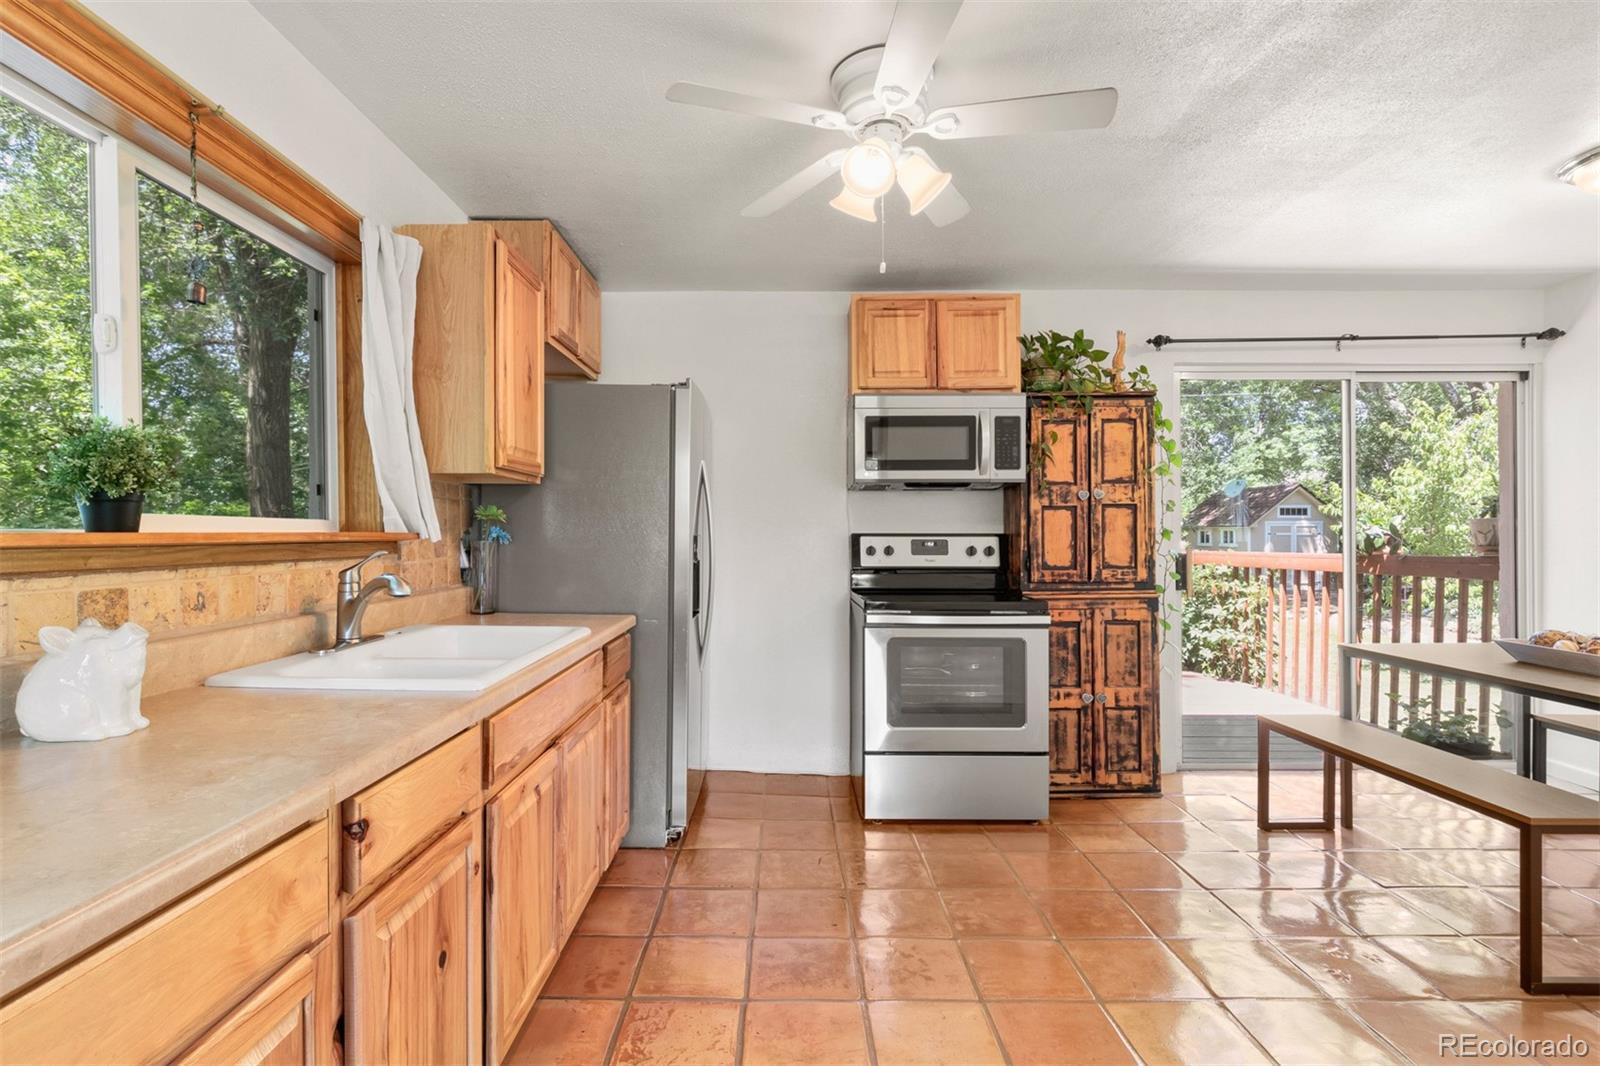 MLS# 6895018 - 4 - 2839 Pierce Street, Wheat Ridge, CO 80214